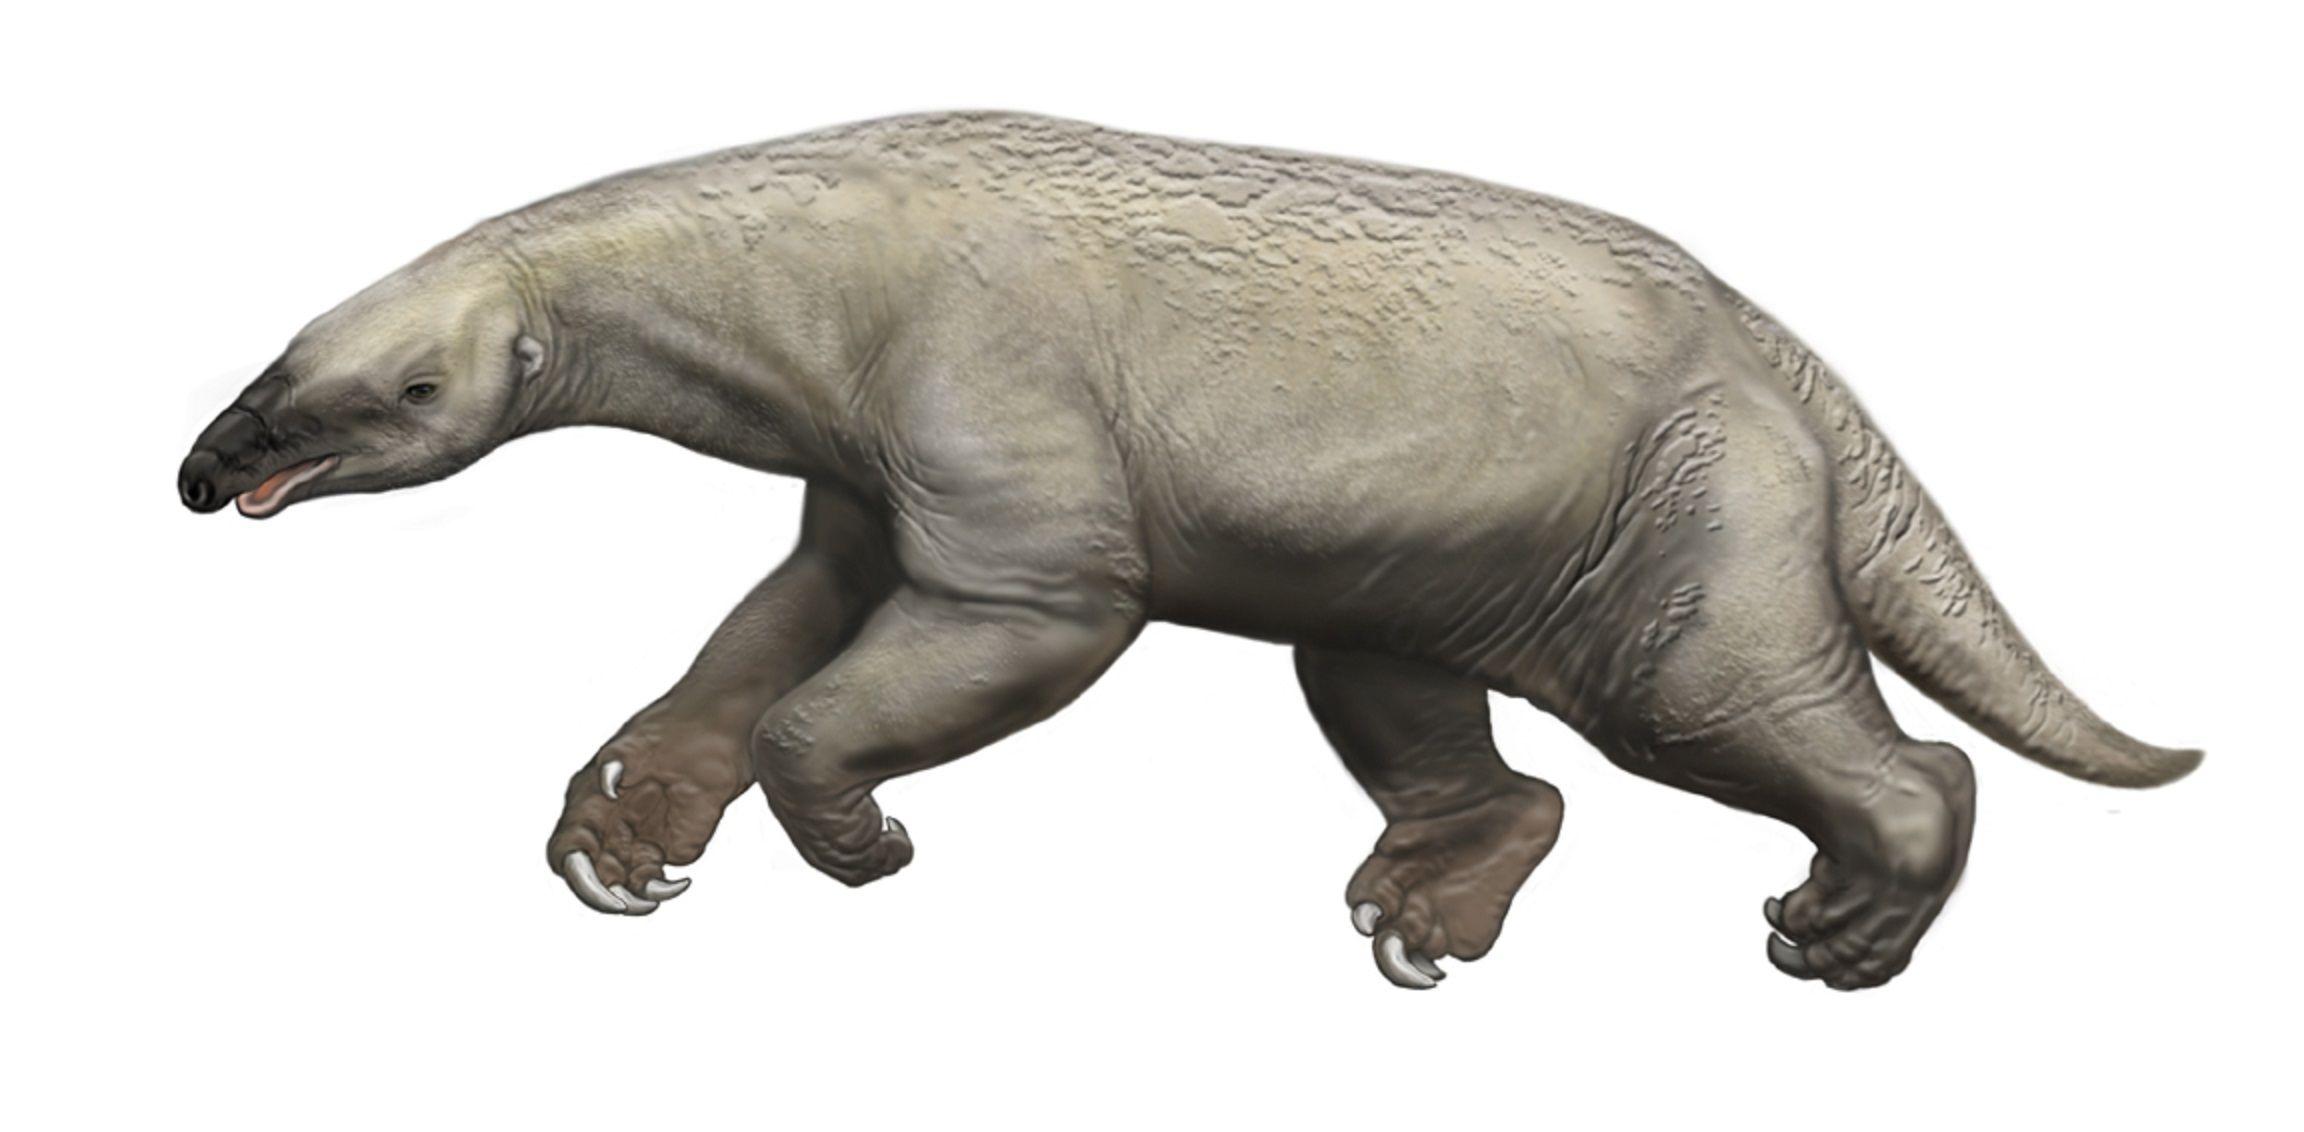 Art illustration Prehistoric Mammals Thalassocnus is